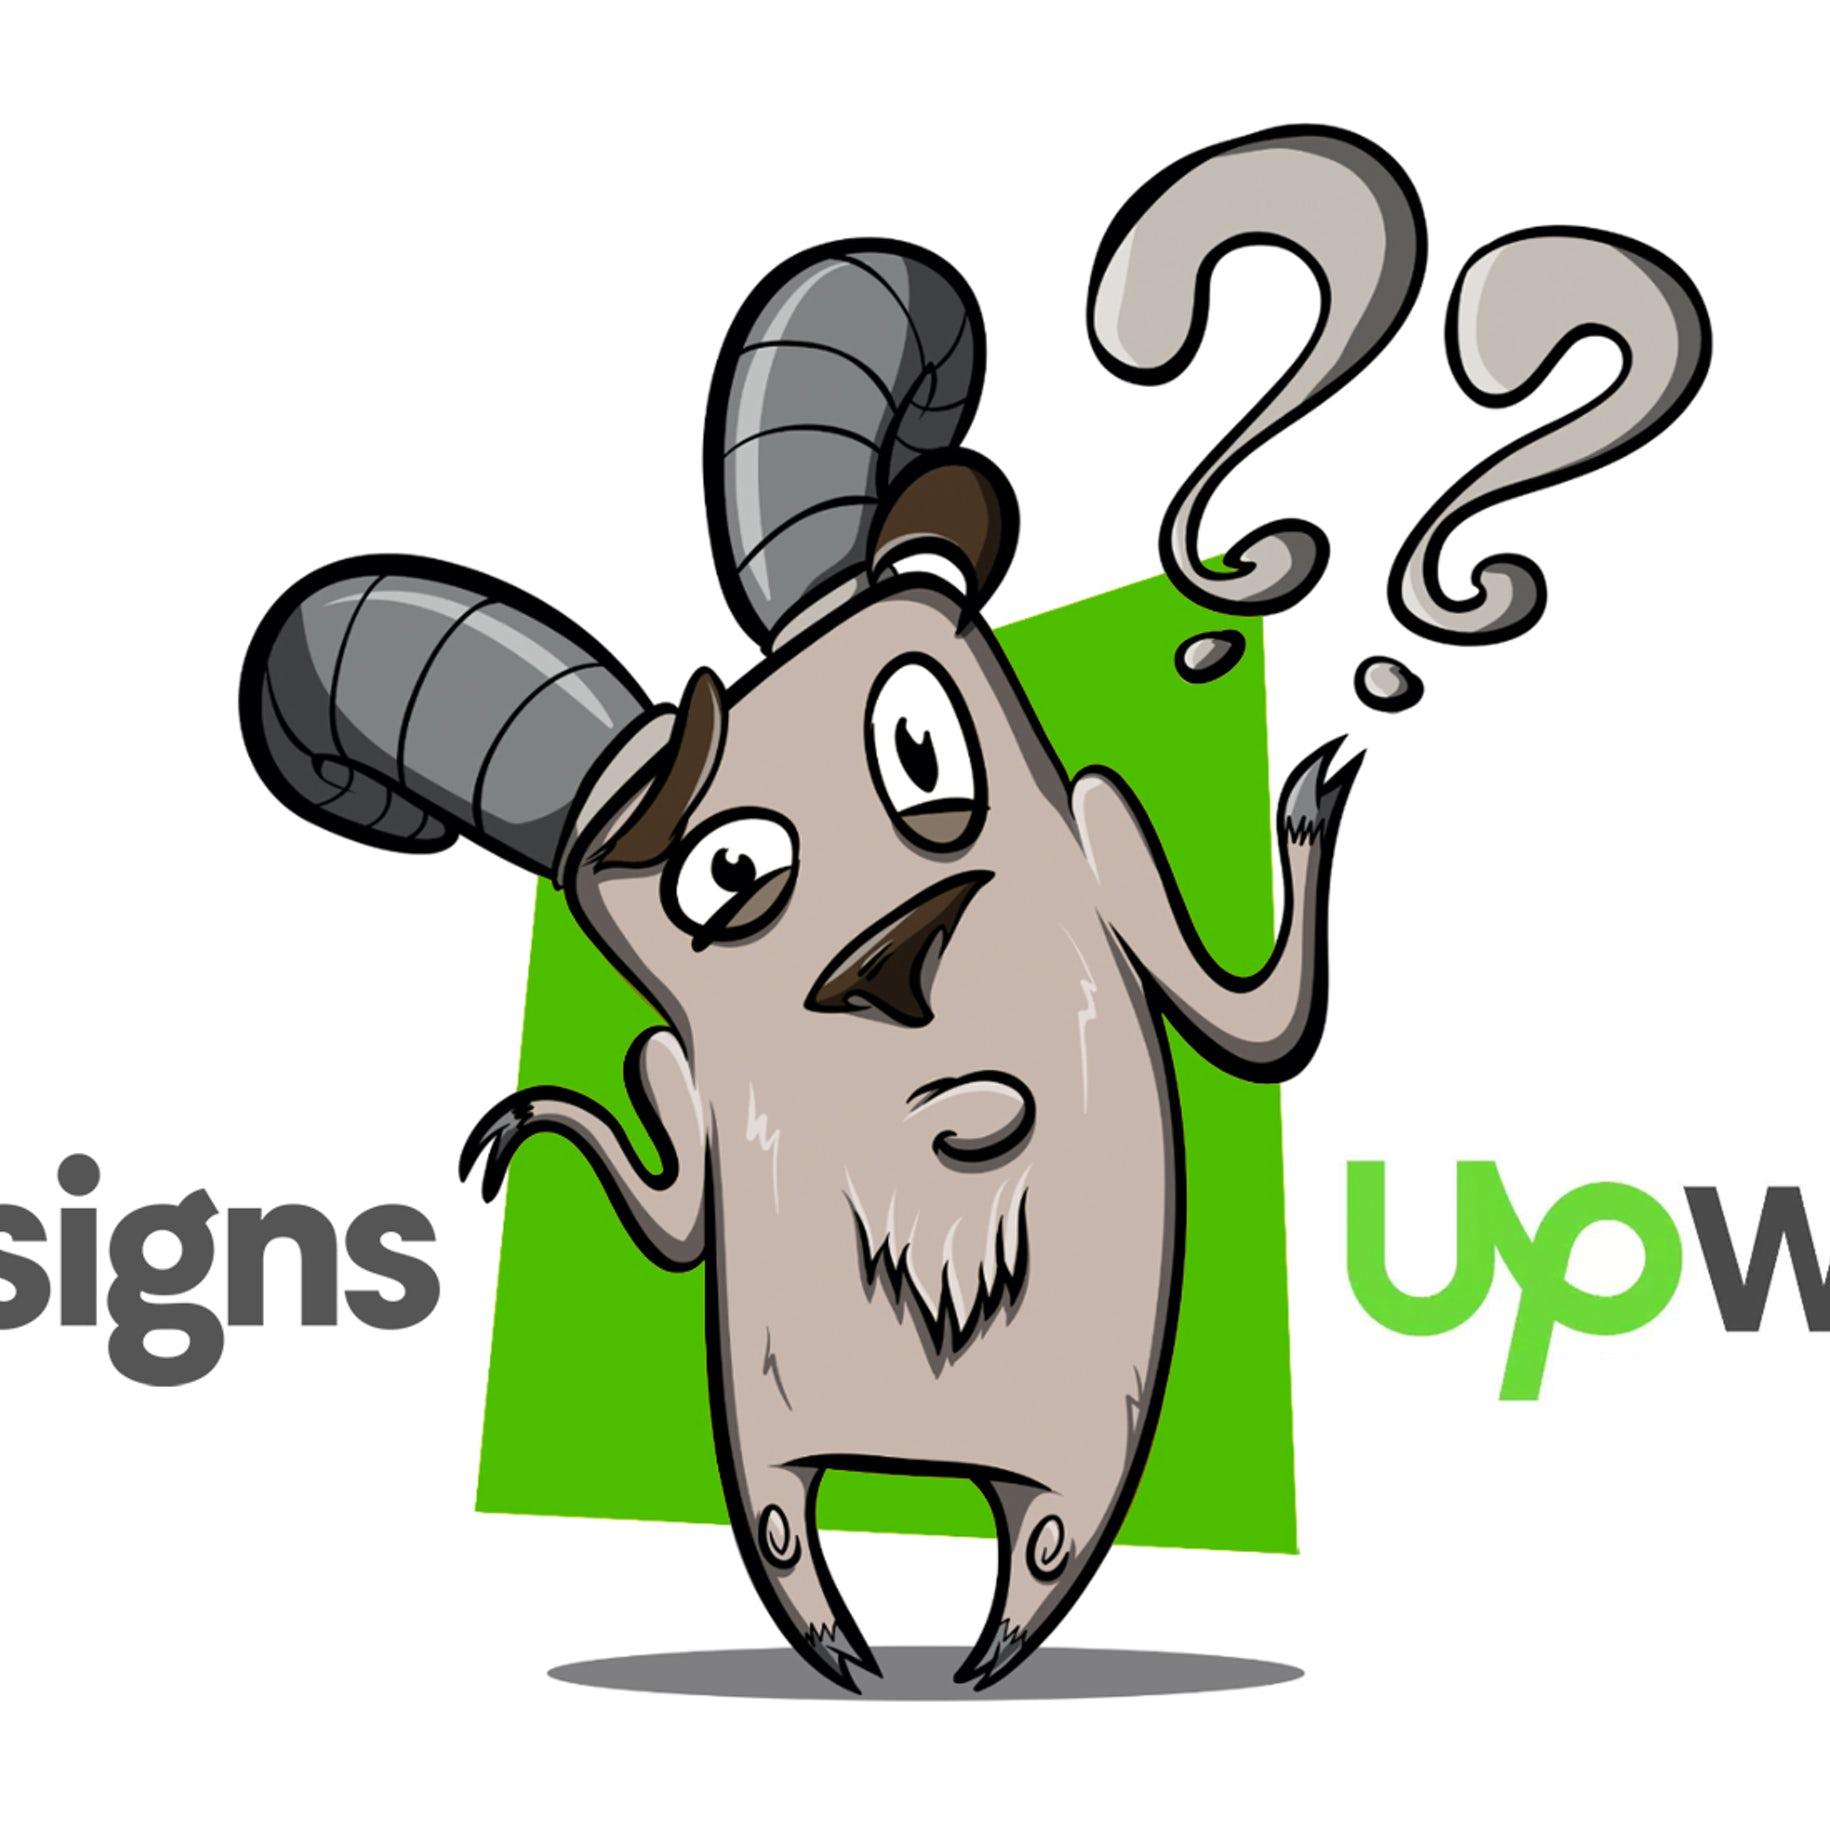 designs vs upwork. Free clipart quotes graphics skills & qualified